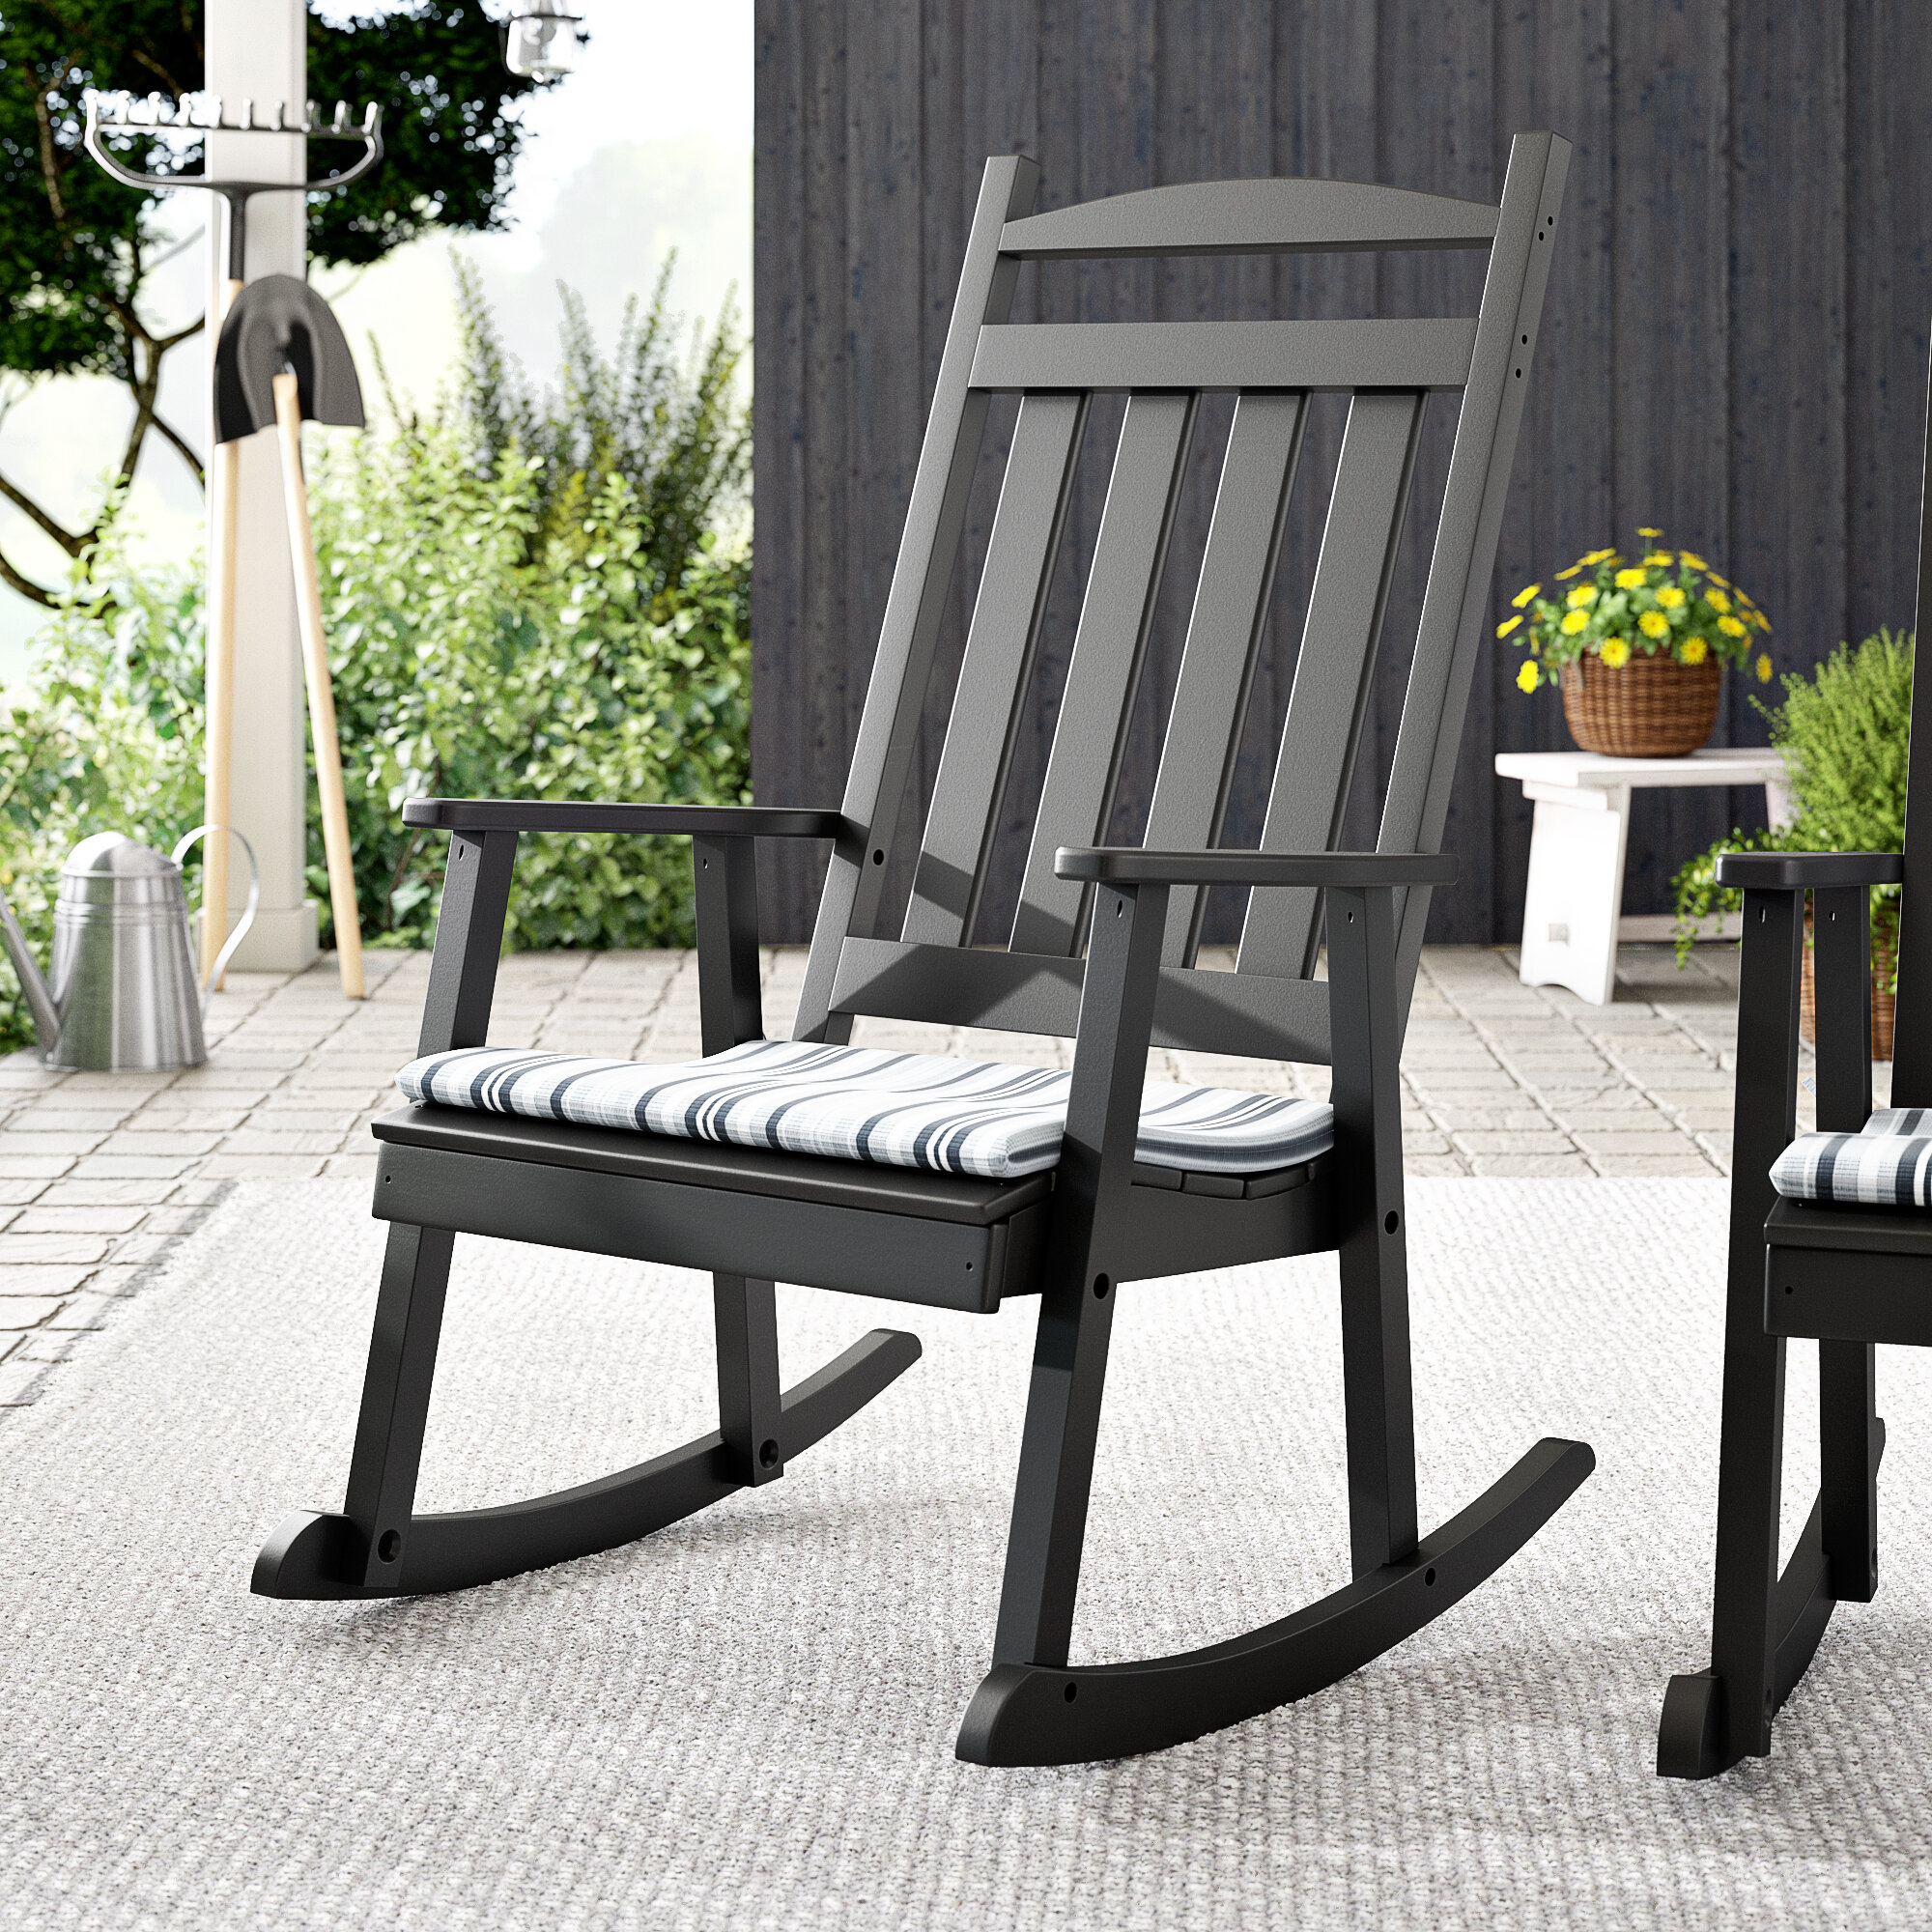 Laurel Foundry Modern Farmhouse Gastonville Classic Porch Rocking Chair U0026  Reviews | Wayfair